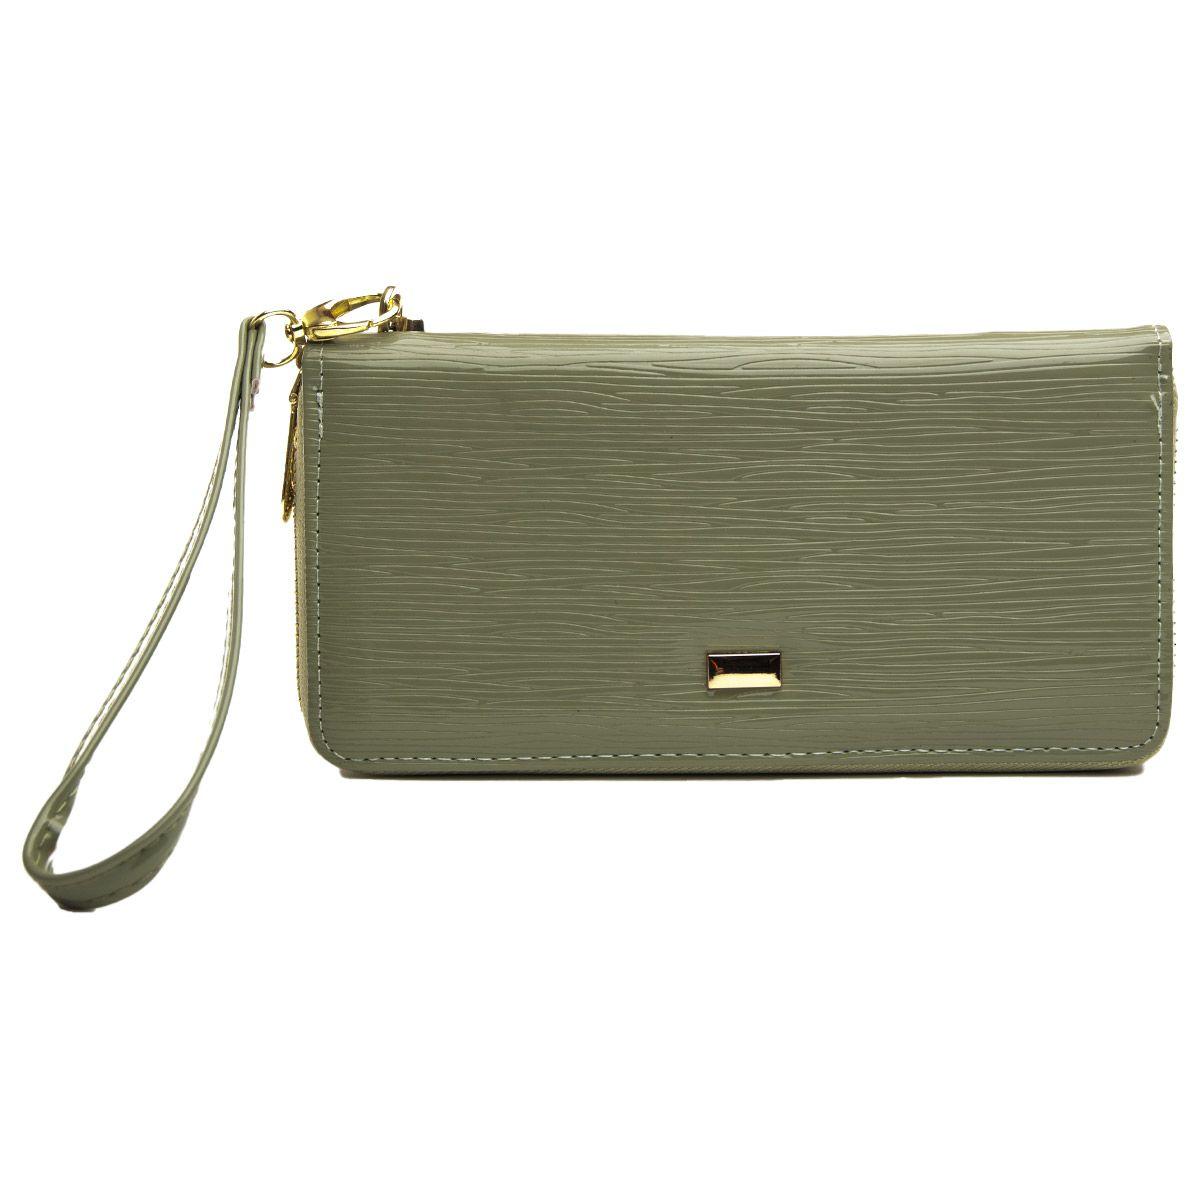 Montevita Leather Purse in Green